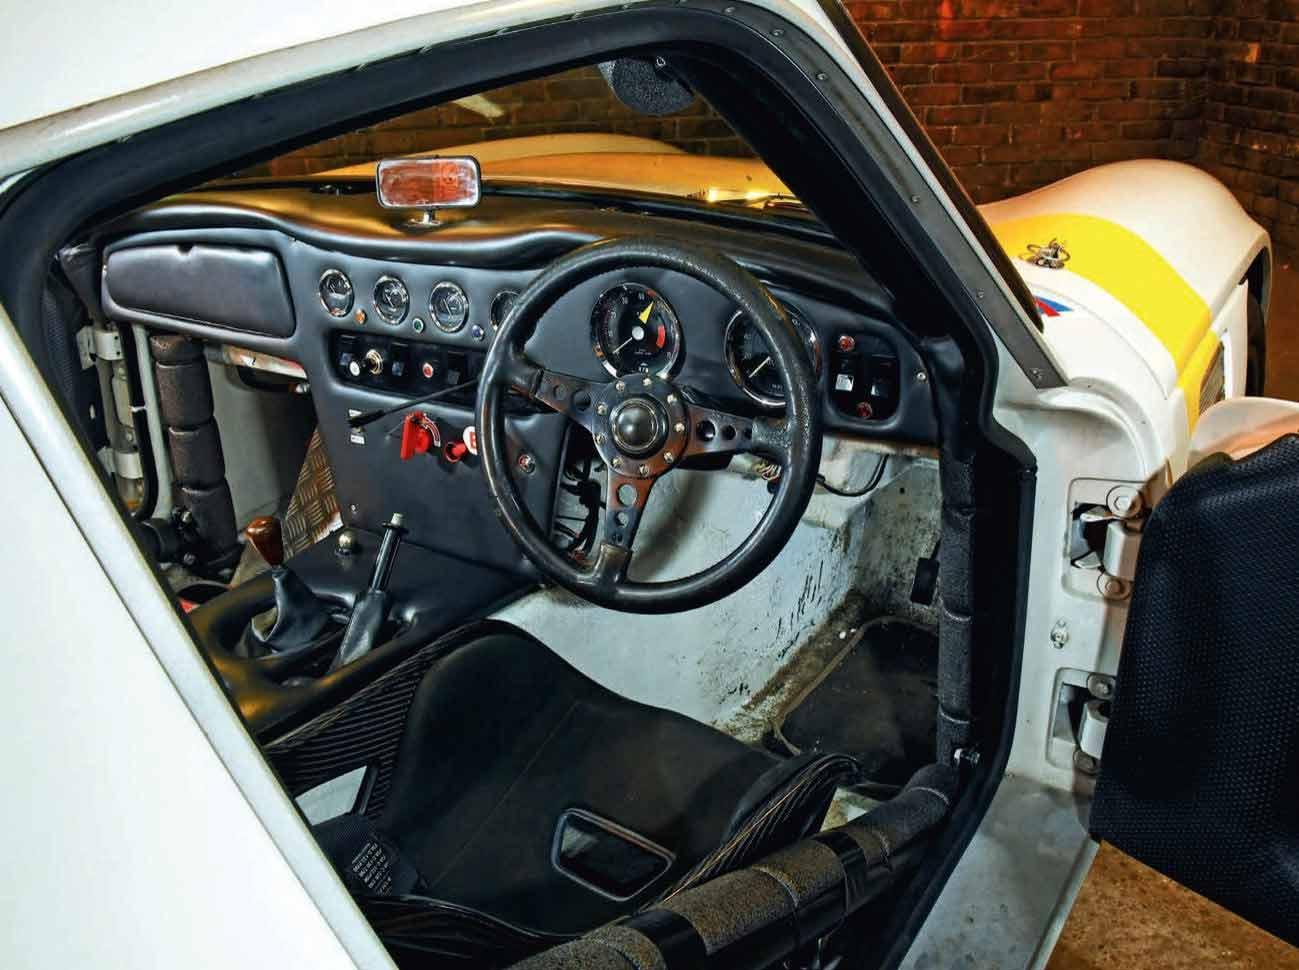 1971 TVR 2500 Vixen interior